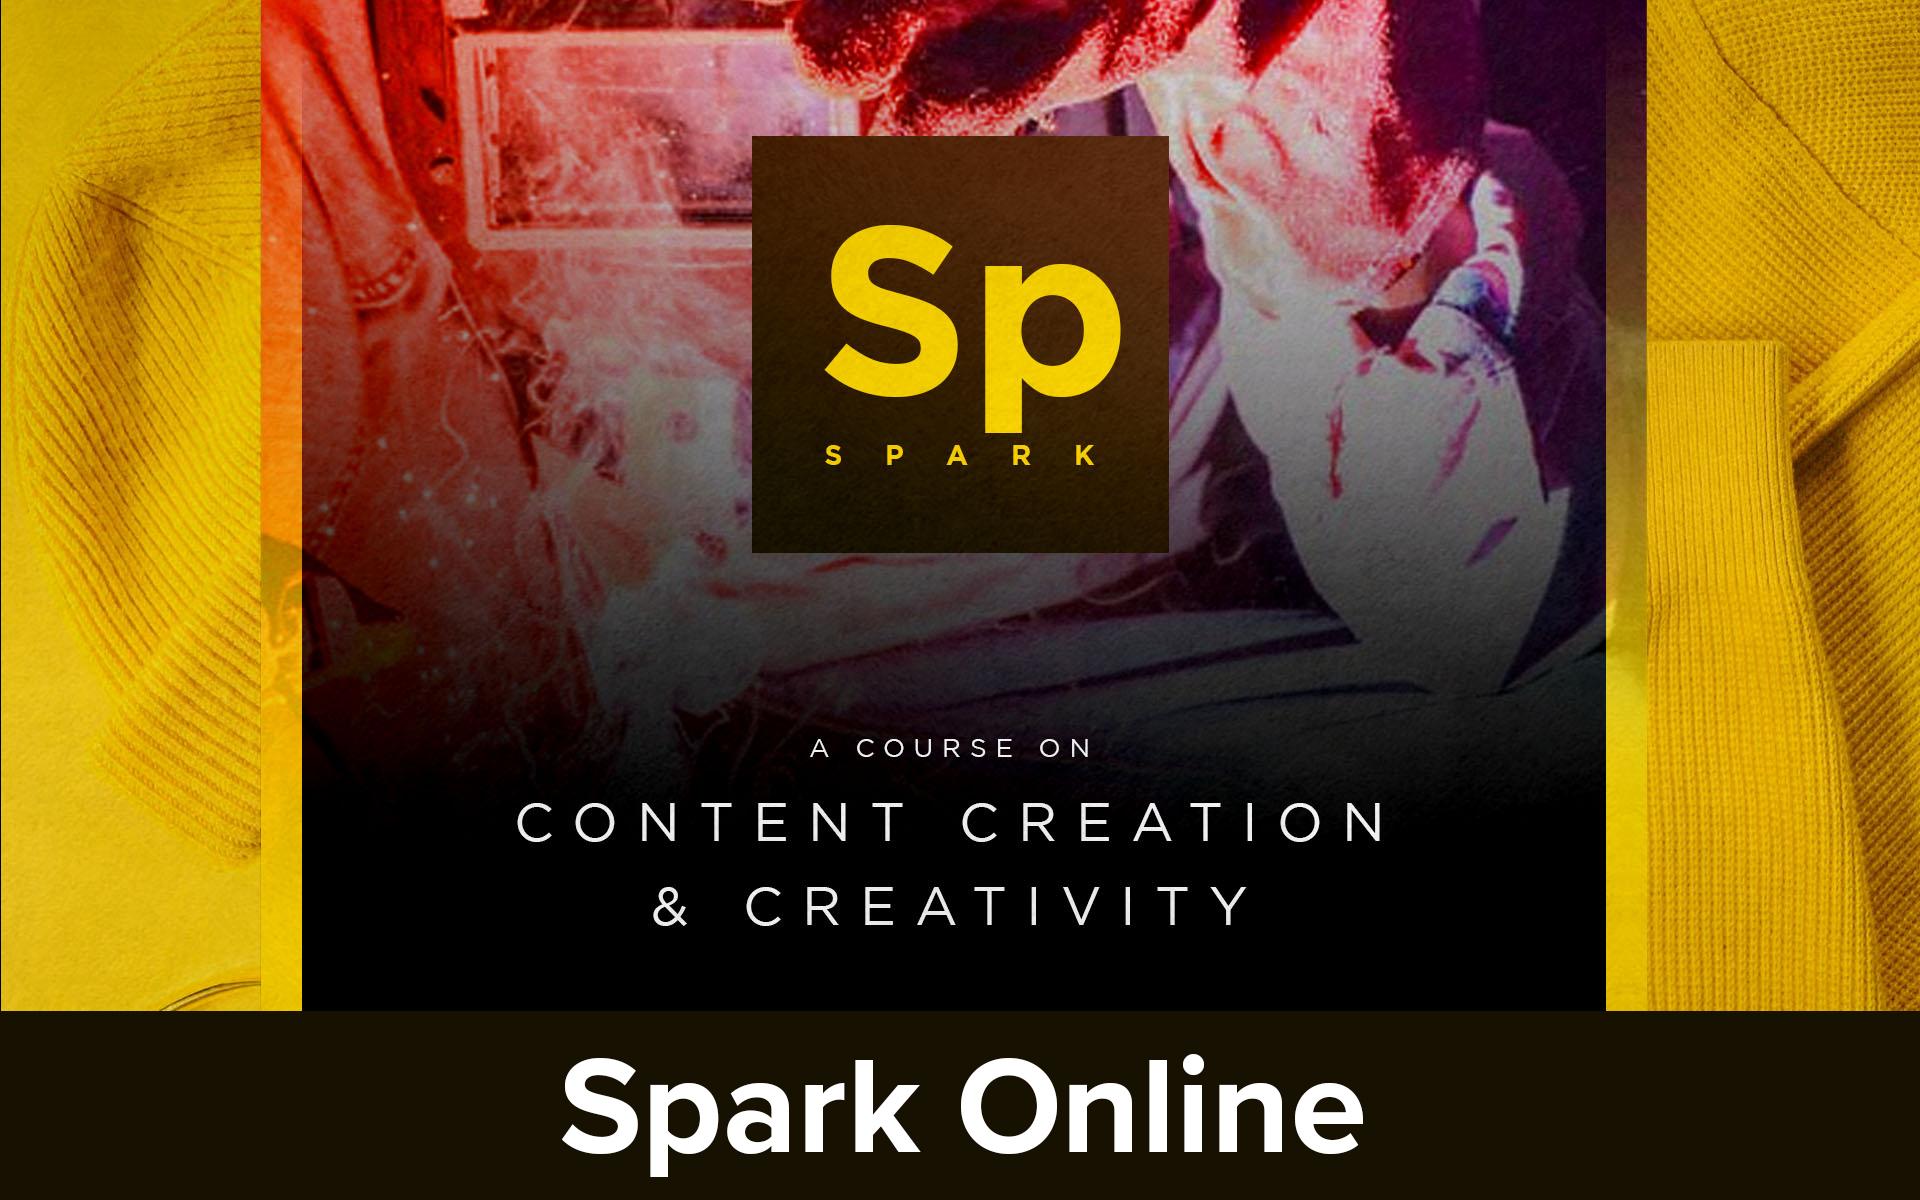 Adobe Spark course image